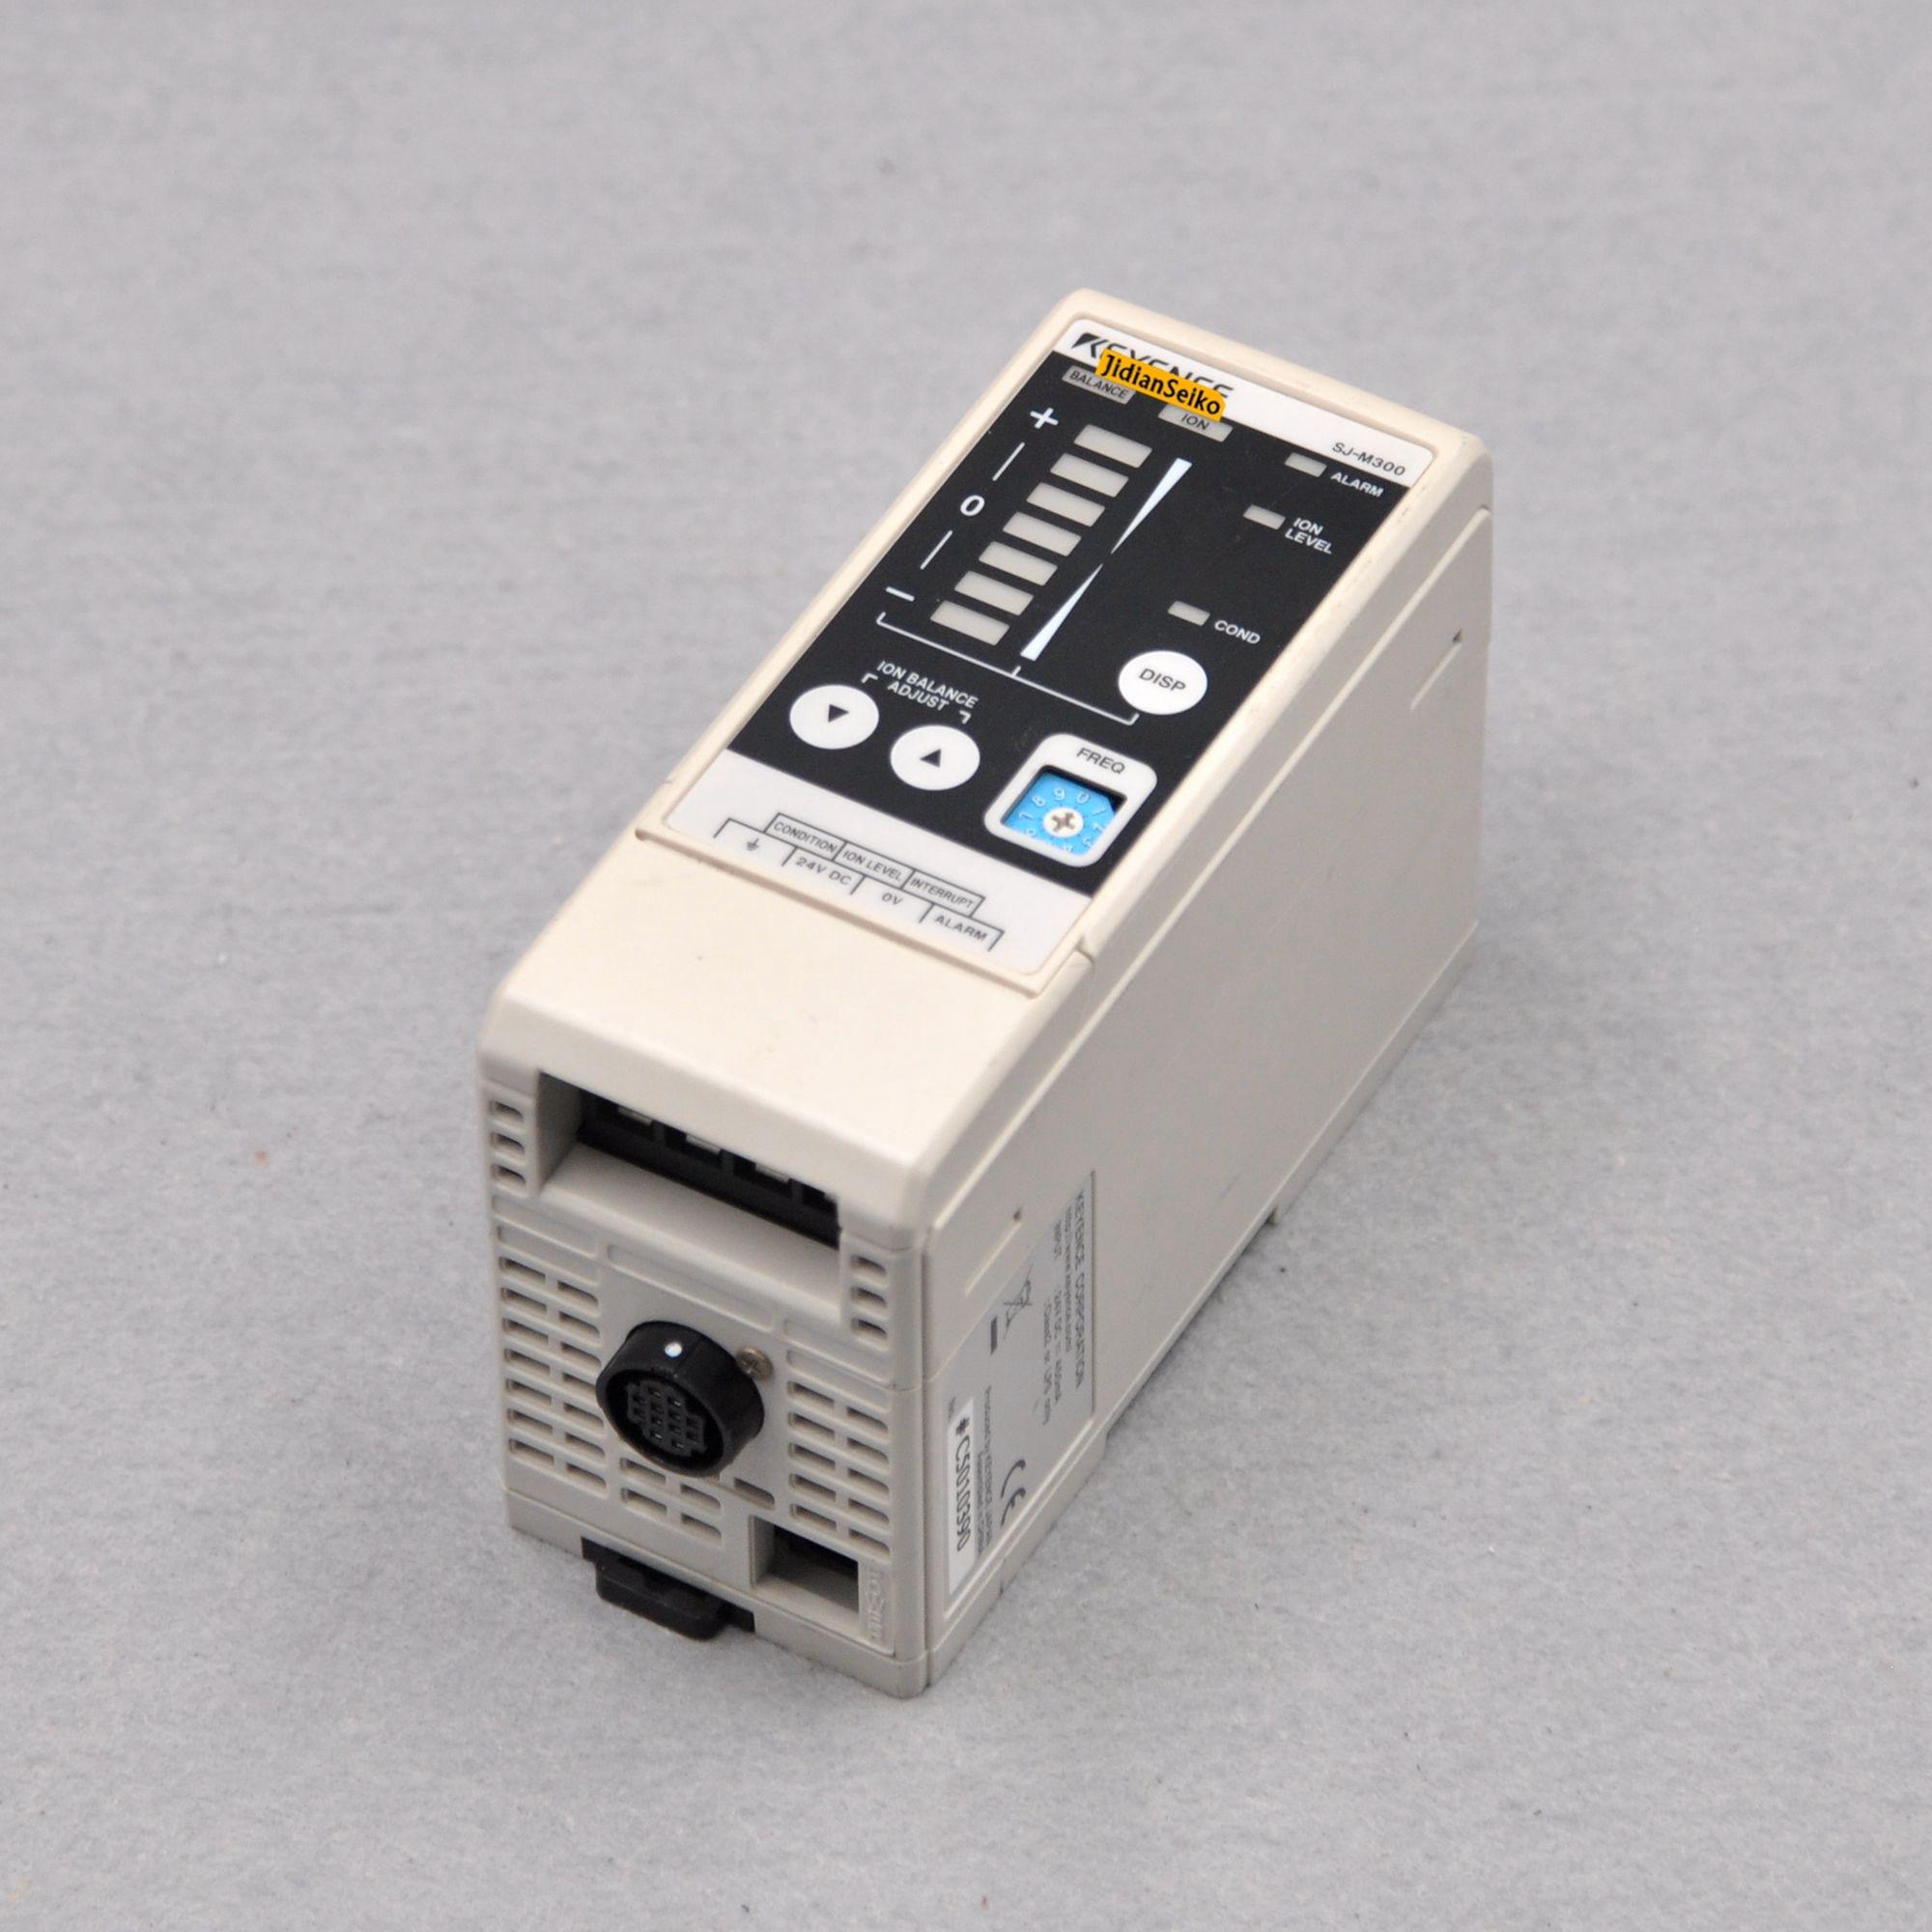 SJ-M030 third generation electrostatic precipitator with SJ-M300 static eliminator controller set for sale enlarge